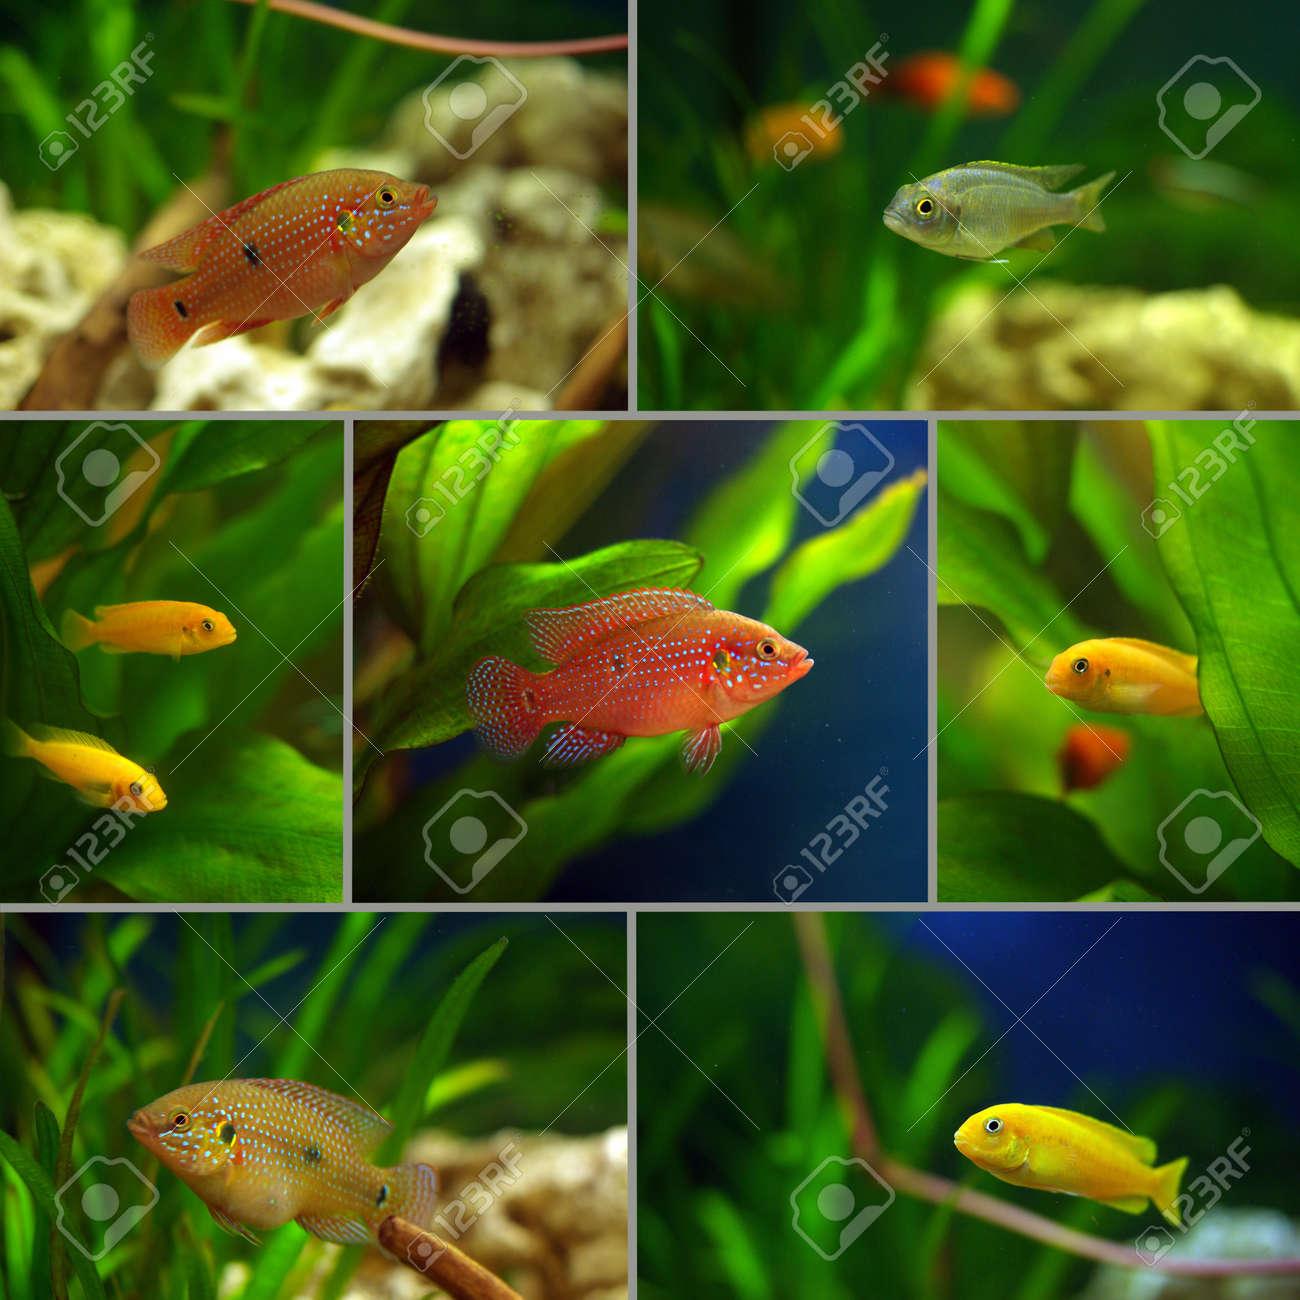 Freshwater aquarium fish cichlids - Stock Photo Collage Cichlid Aquarium Fish In The Aquarium